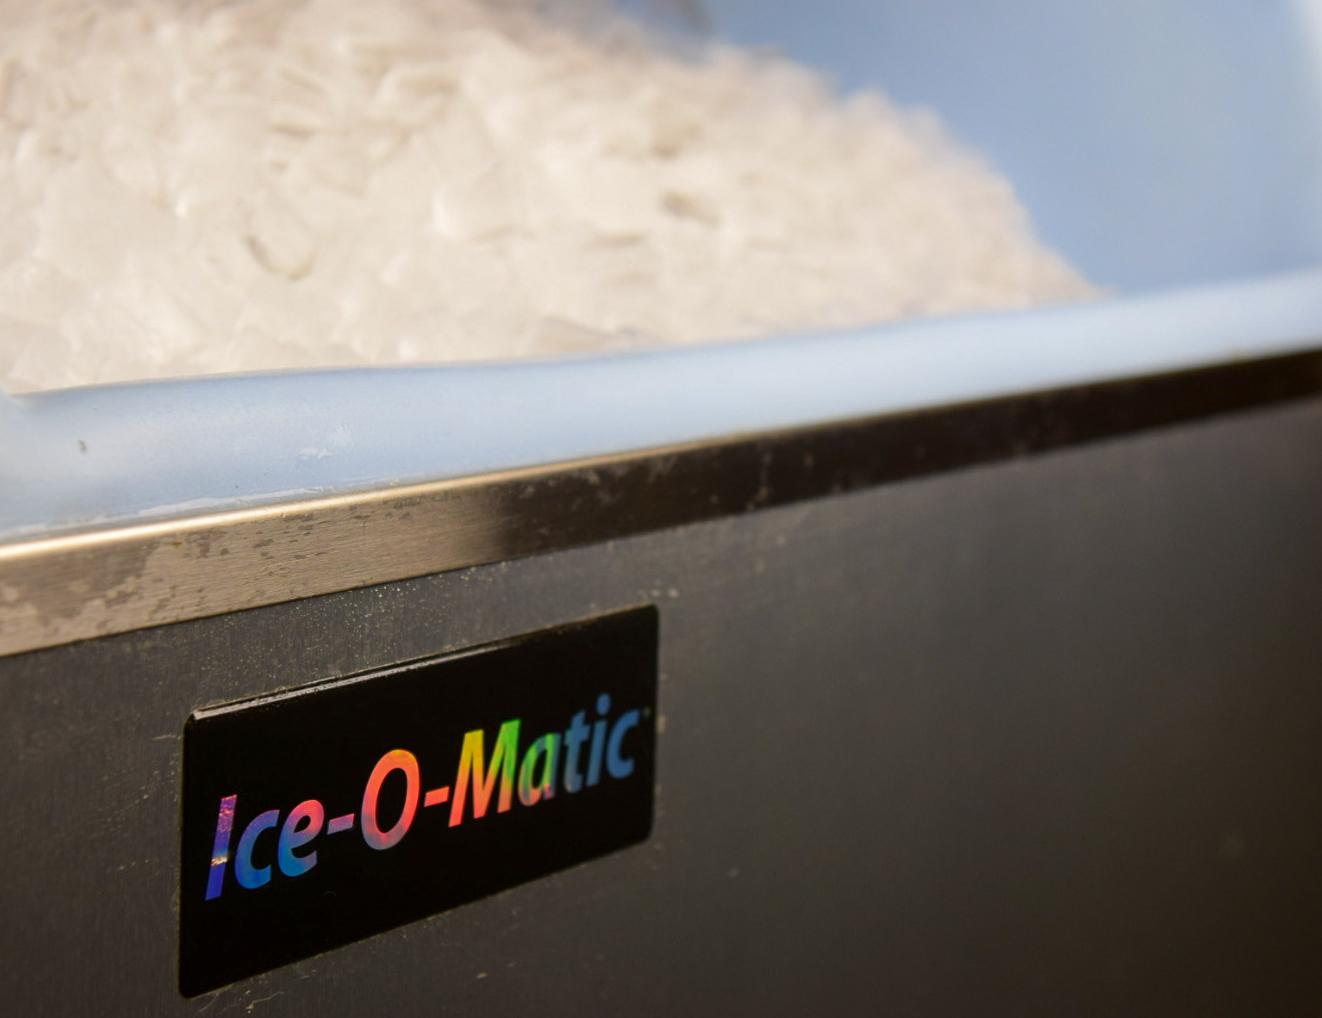 Ice Sanitation